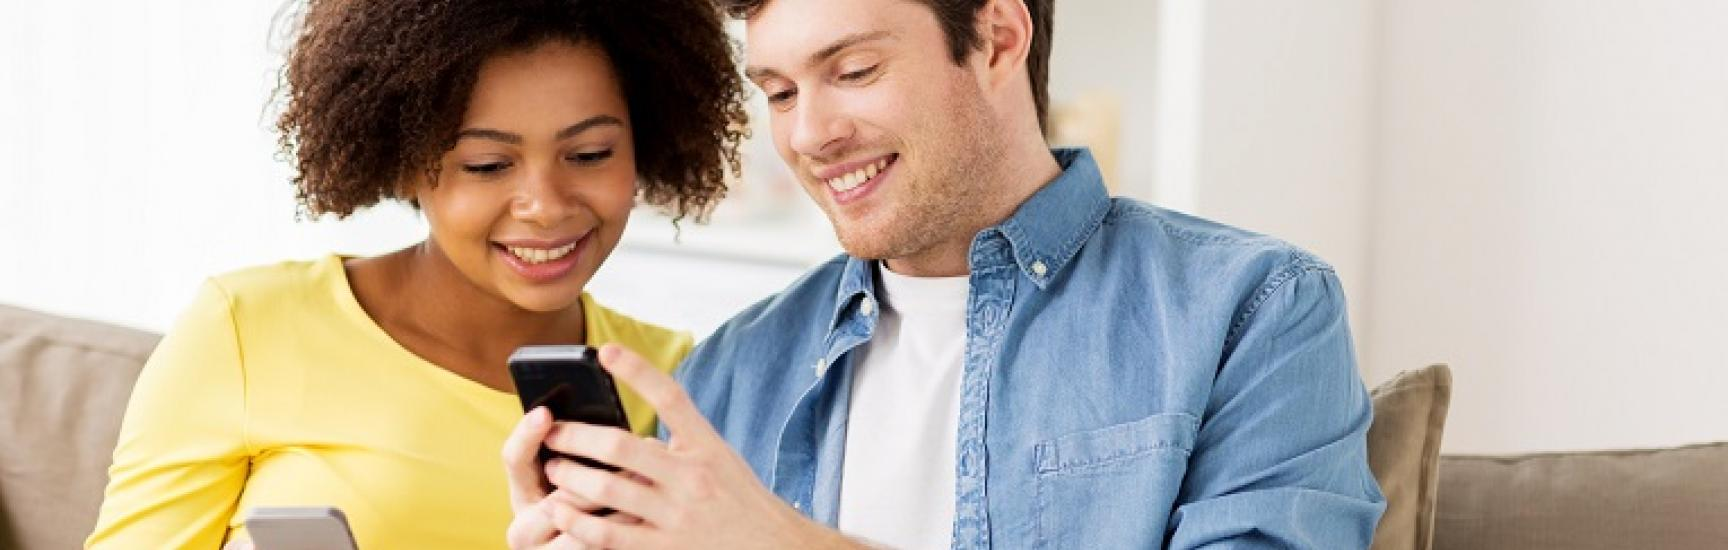 Incorporating Innovation: Surex Continues Canadian Insurance Revolution